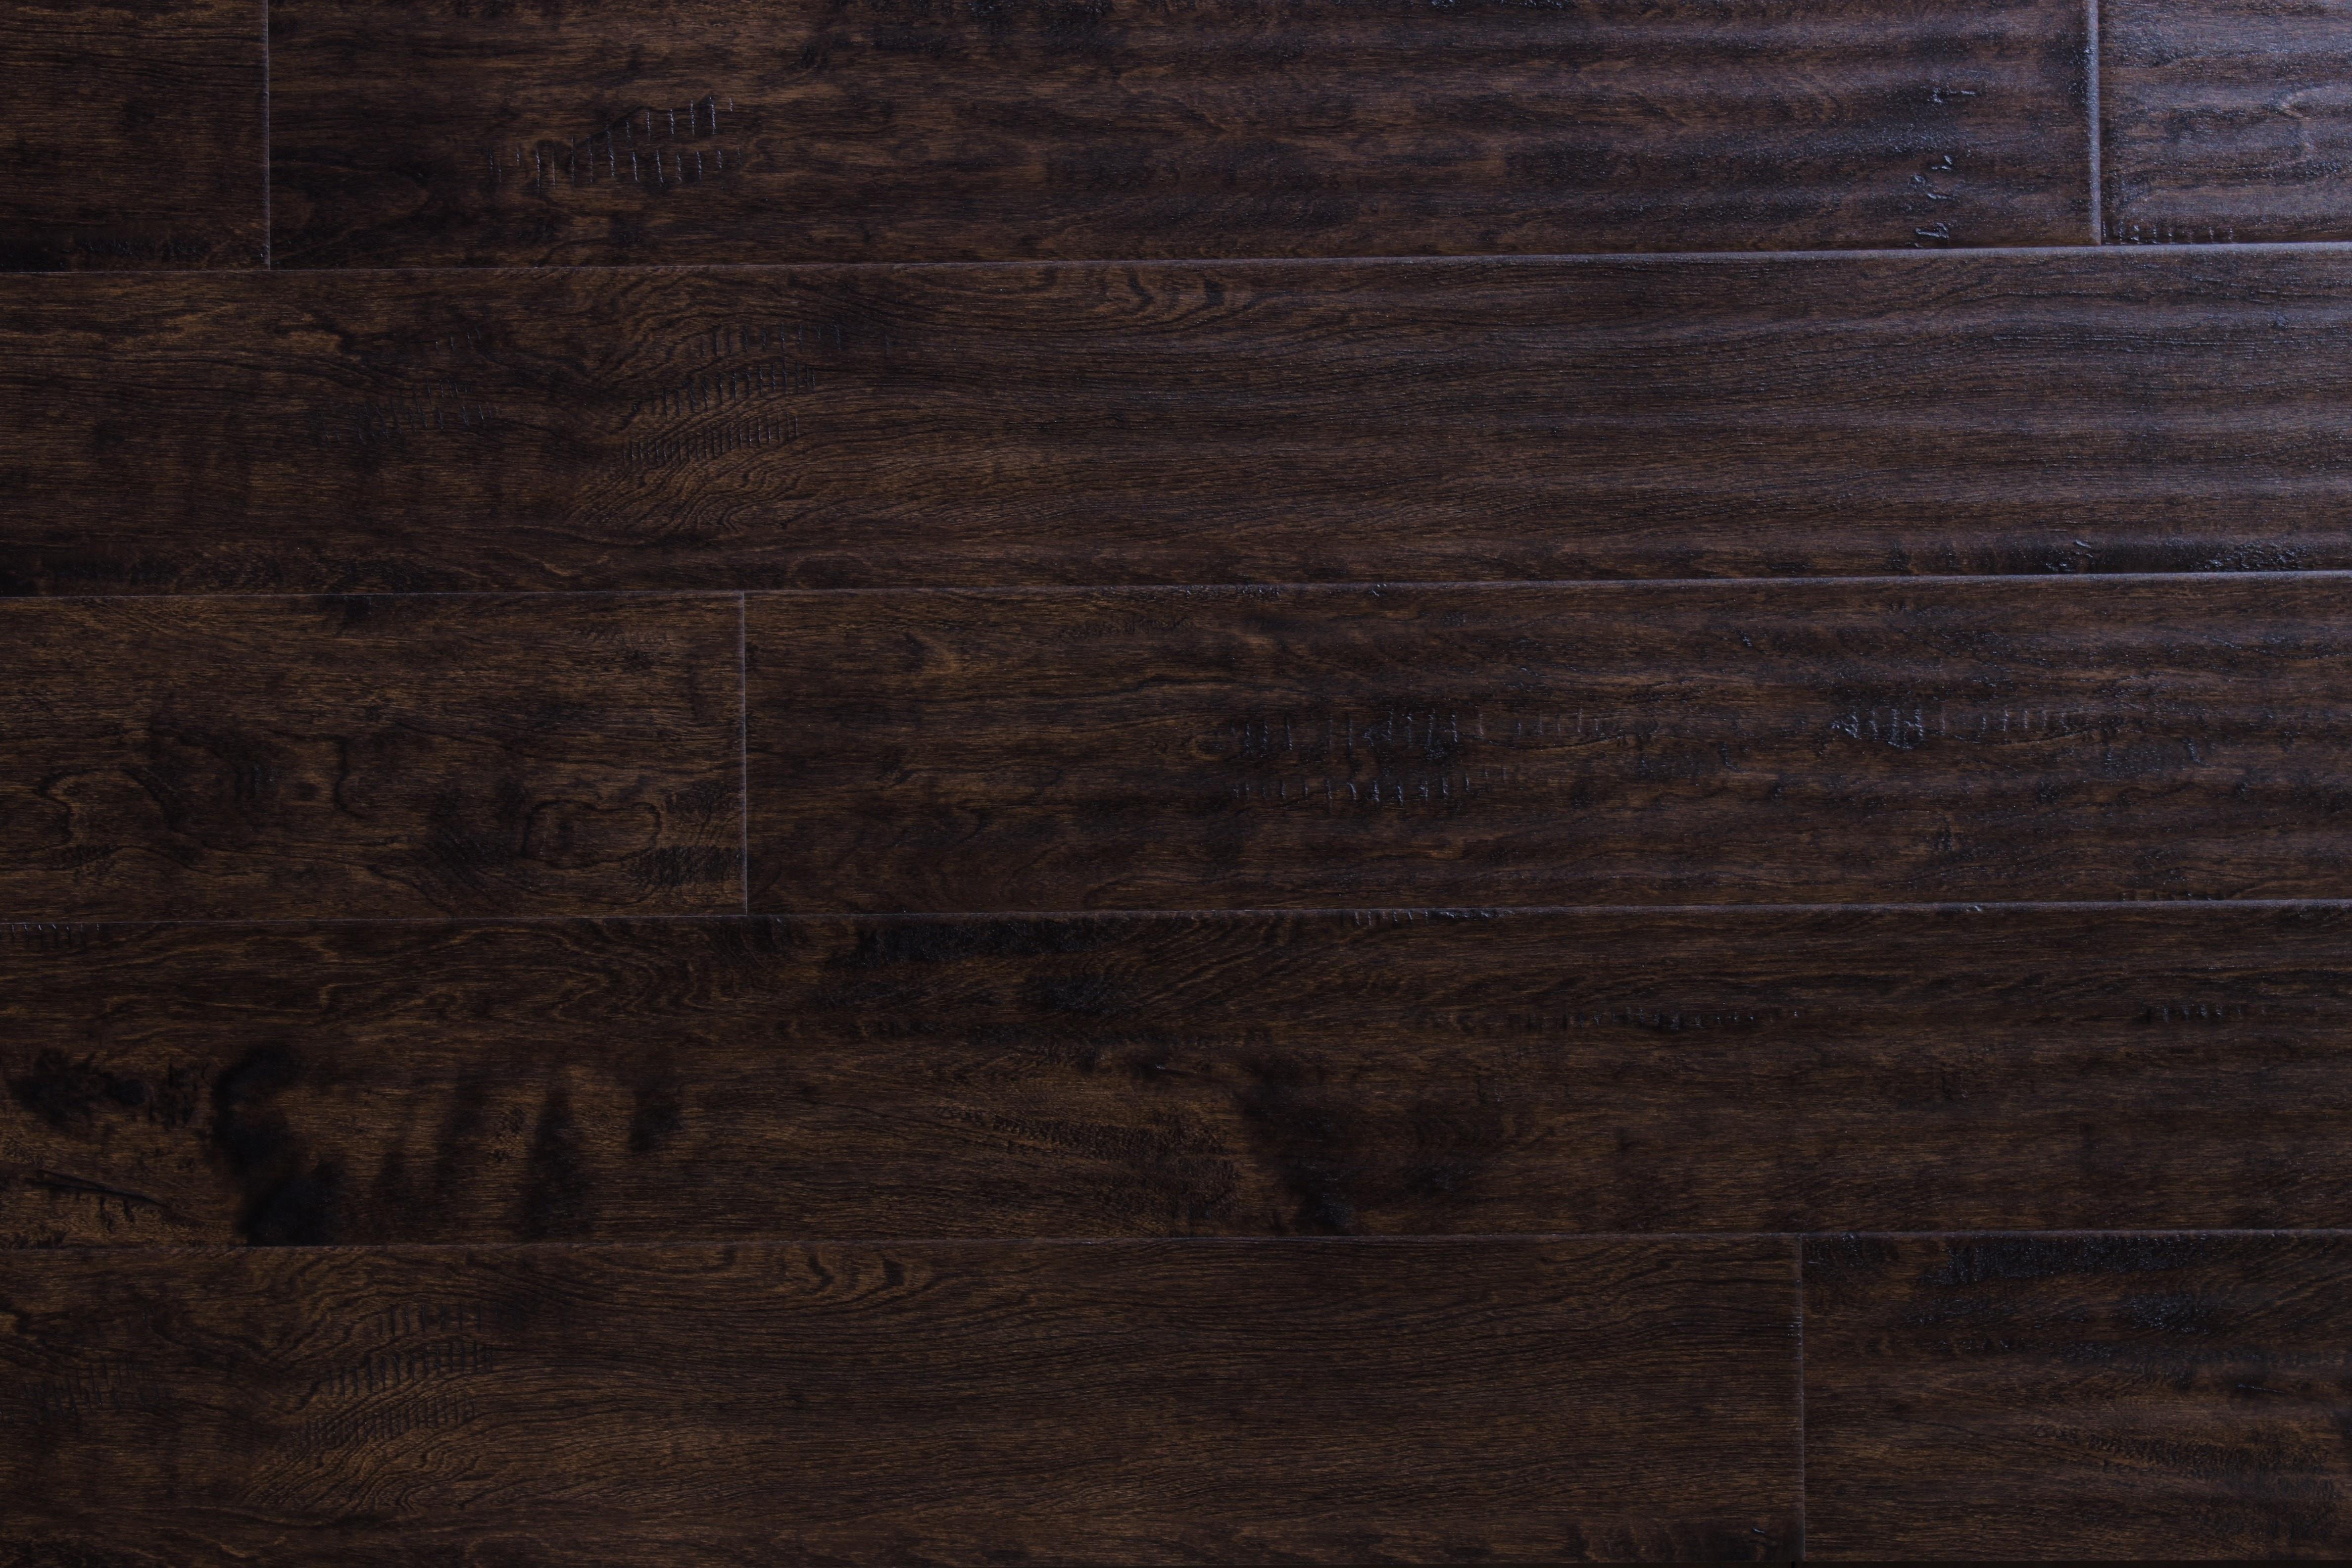 hardwood floor installation cost toronto of wood flooring free samples available at builddirecta regarding tailor multi gb 5874277bb8d3c